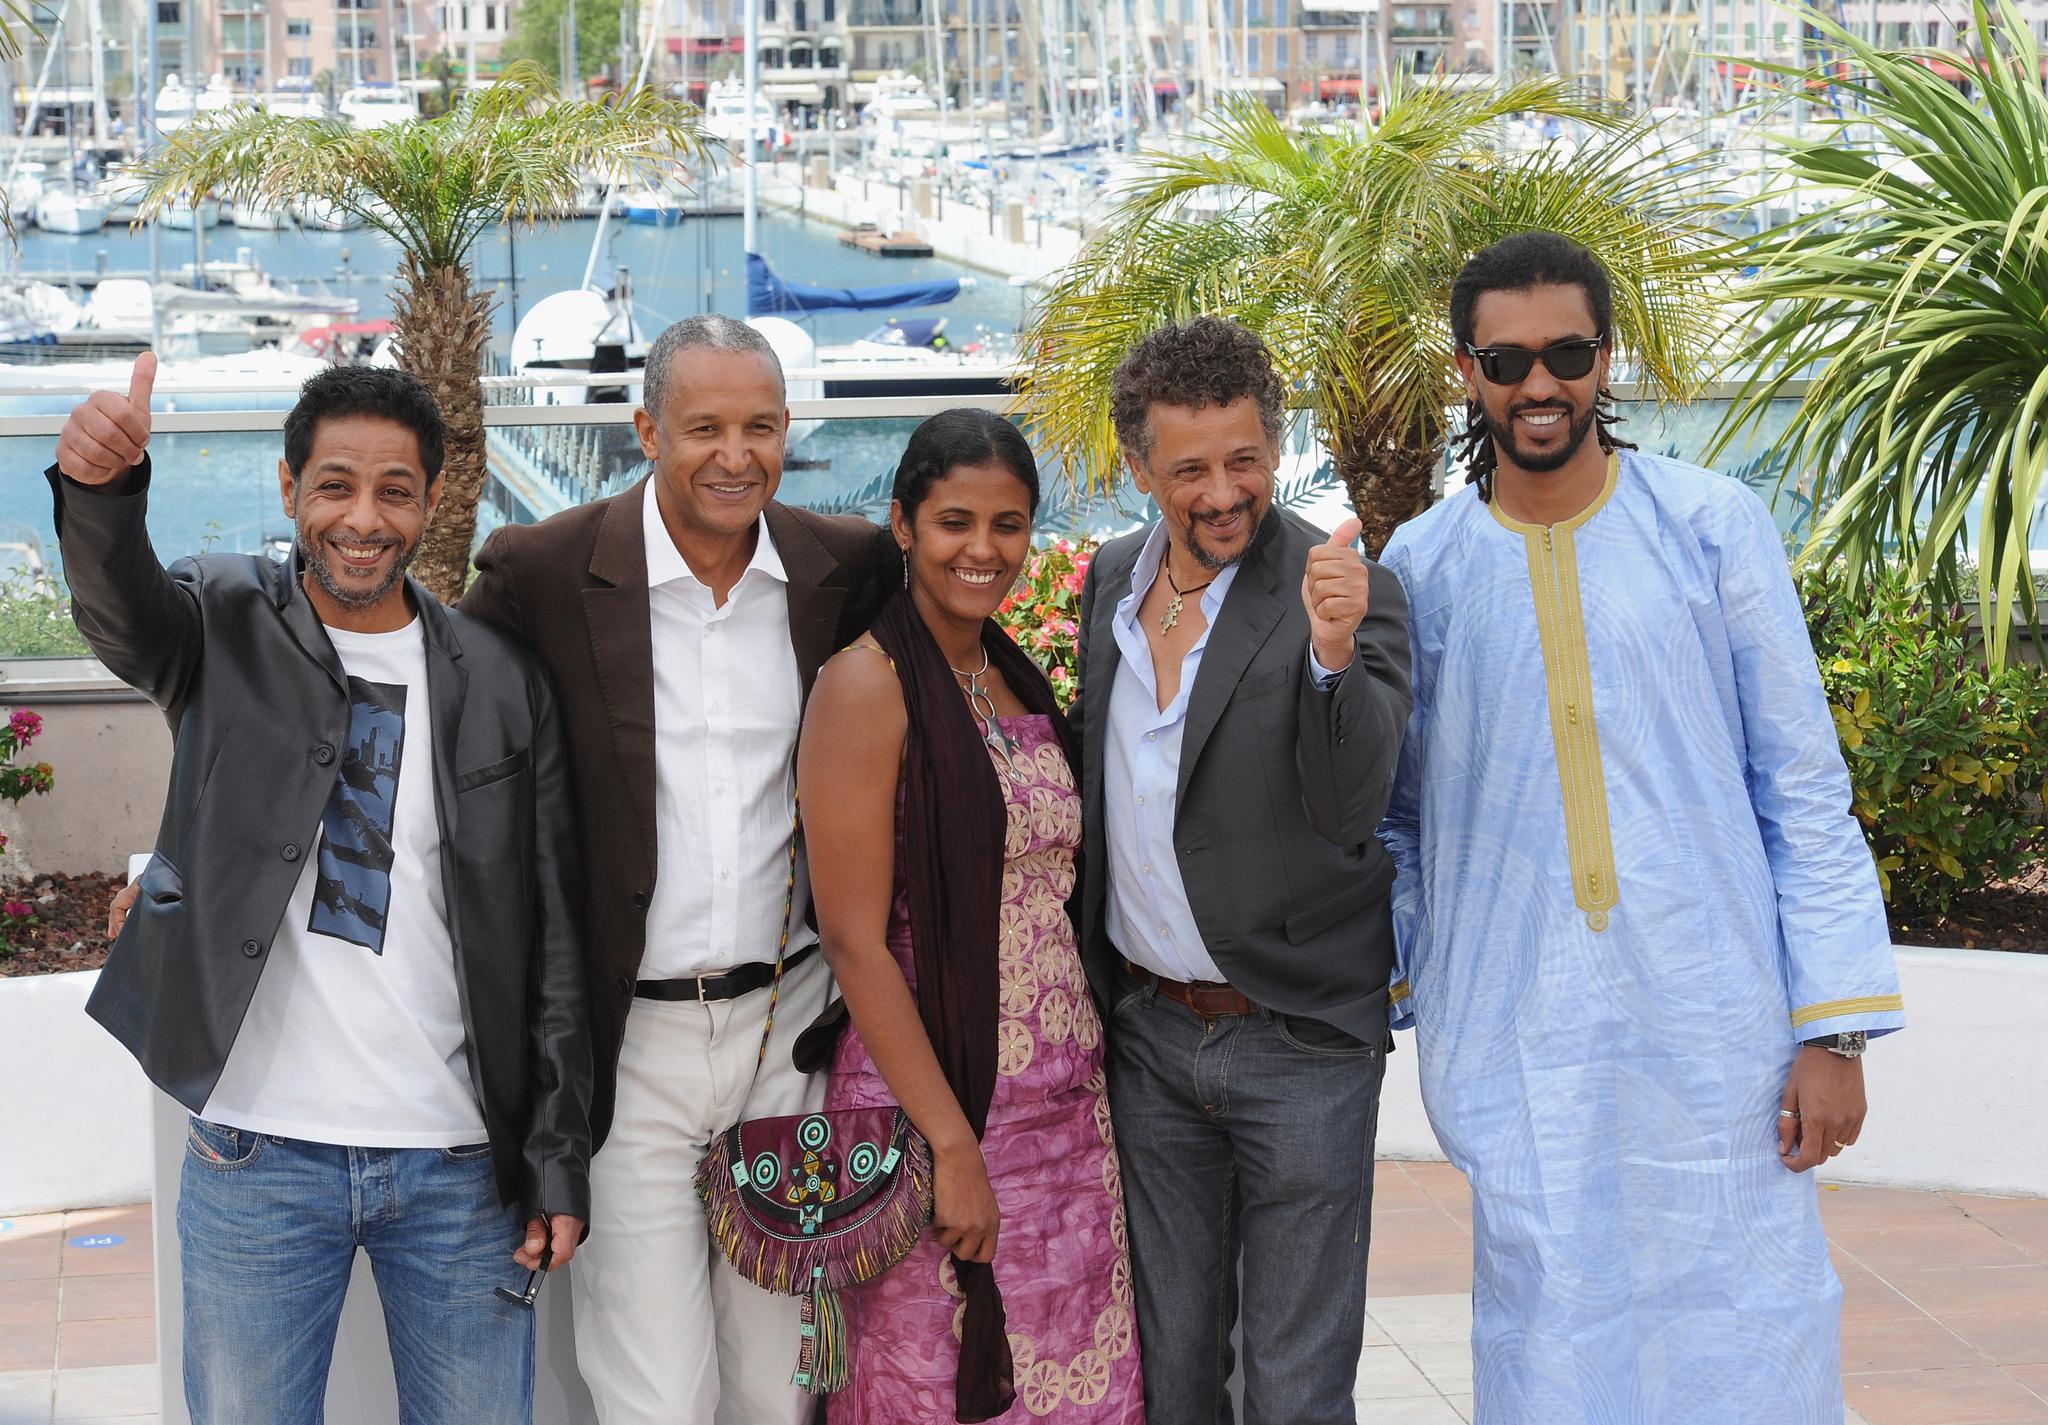 Abel Jafri, Abderrahmane Sissako, Ibrahim Ahmed, Hichem Yacoubi, and Toulou Kiki at an event for Timbuktu (2014)